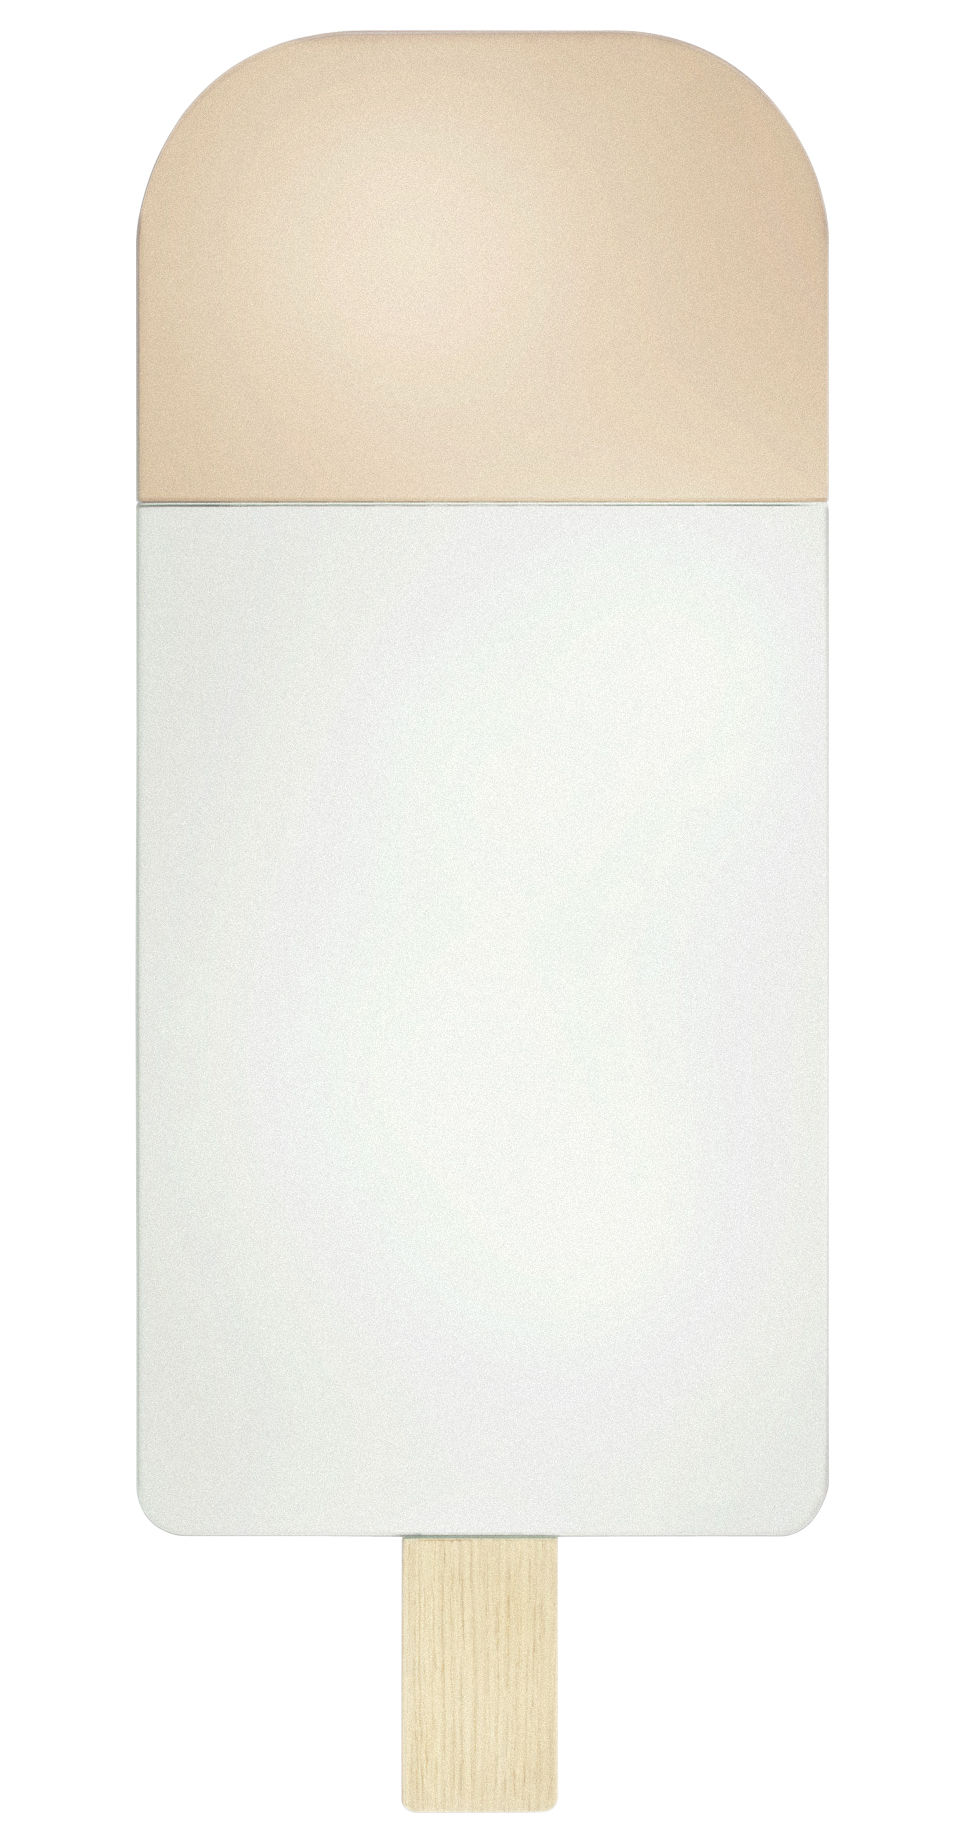 Decoration - Mirrors - Ice Cream Wall mirror - H 57 cm by Elements Optimal - Warm pink & mirror/ Light wood - Glass, Oak